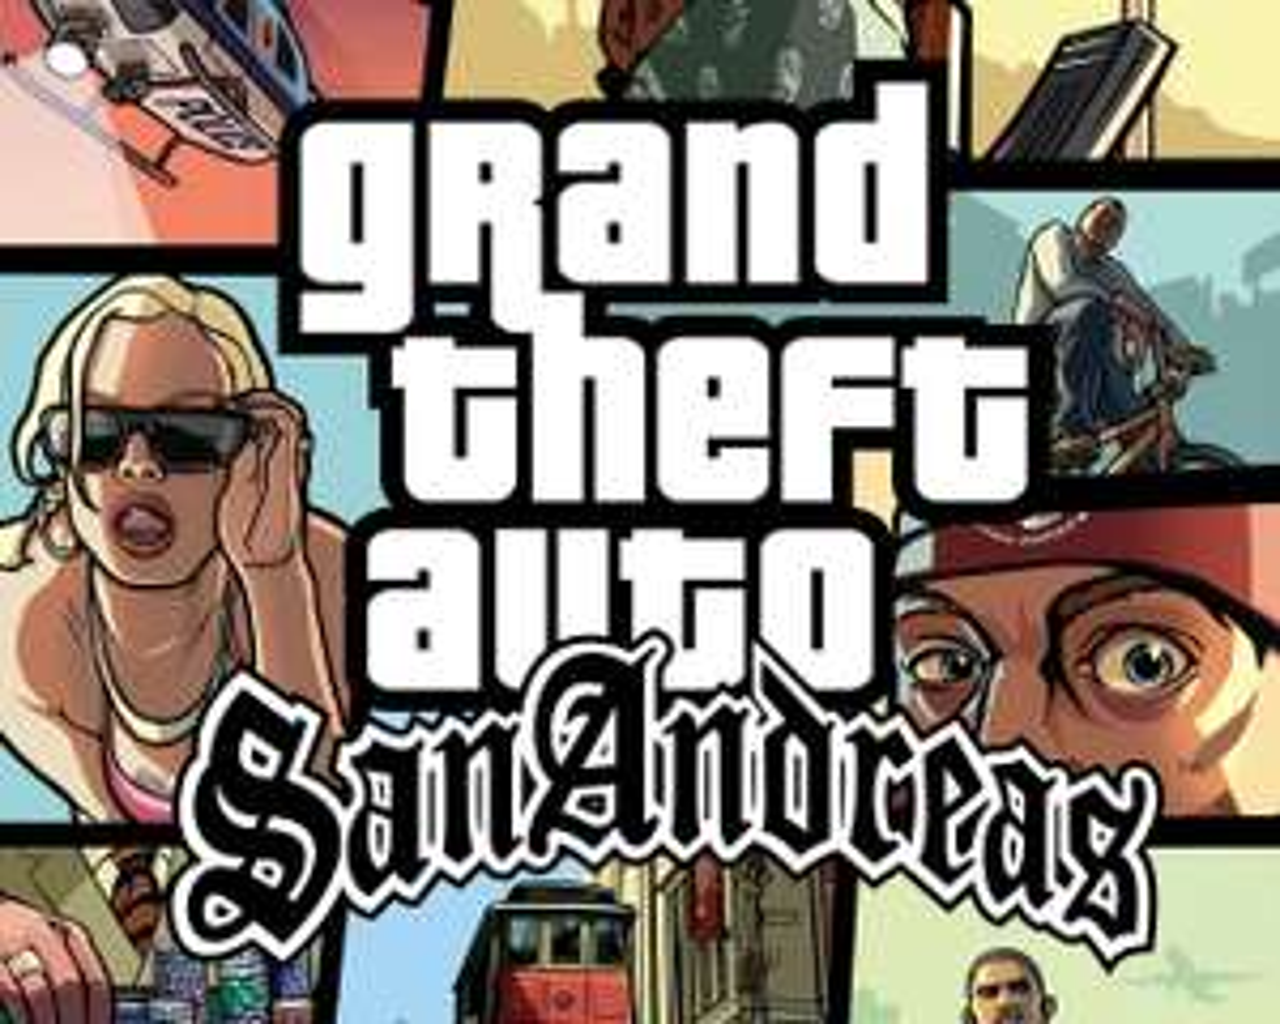 [Rockstar Games] Grand Theft Auto: San Andreas GRATIS in neuem Rockstar Launcher (Windows)